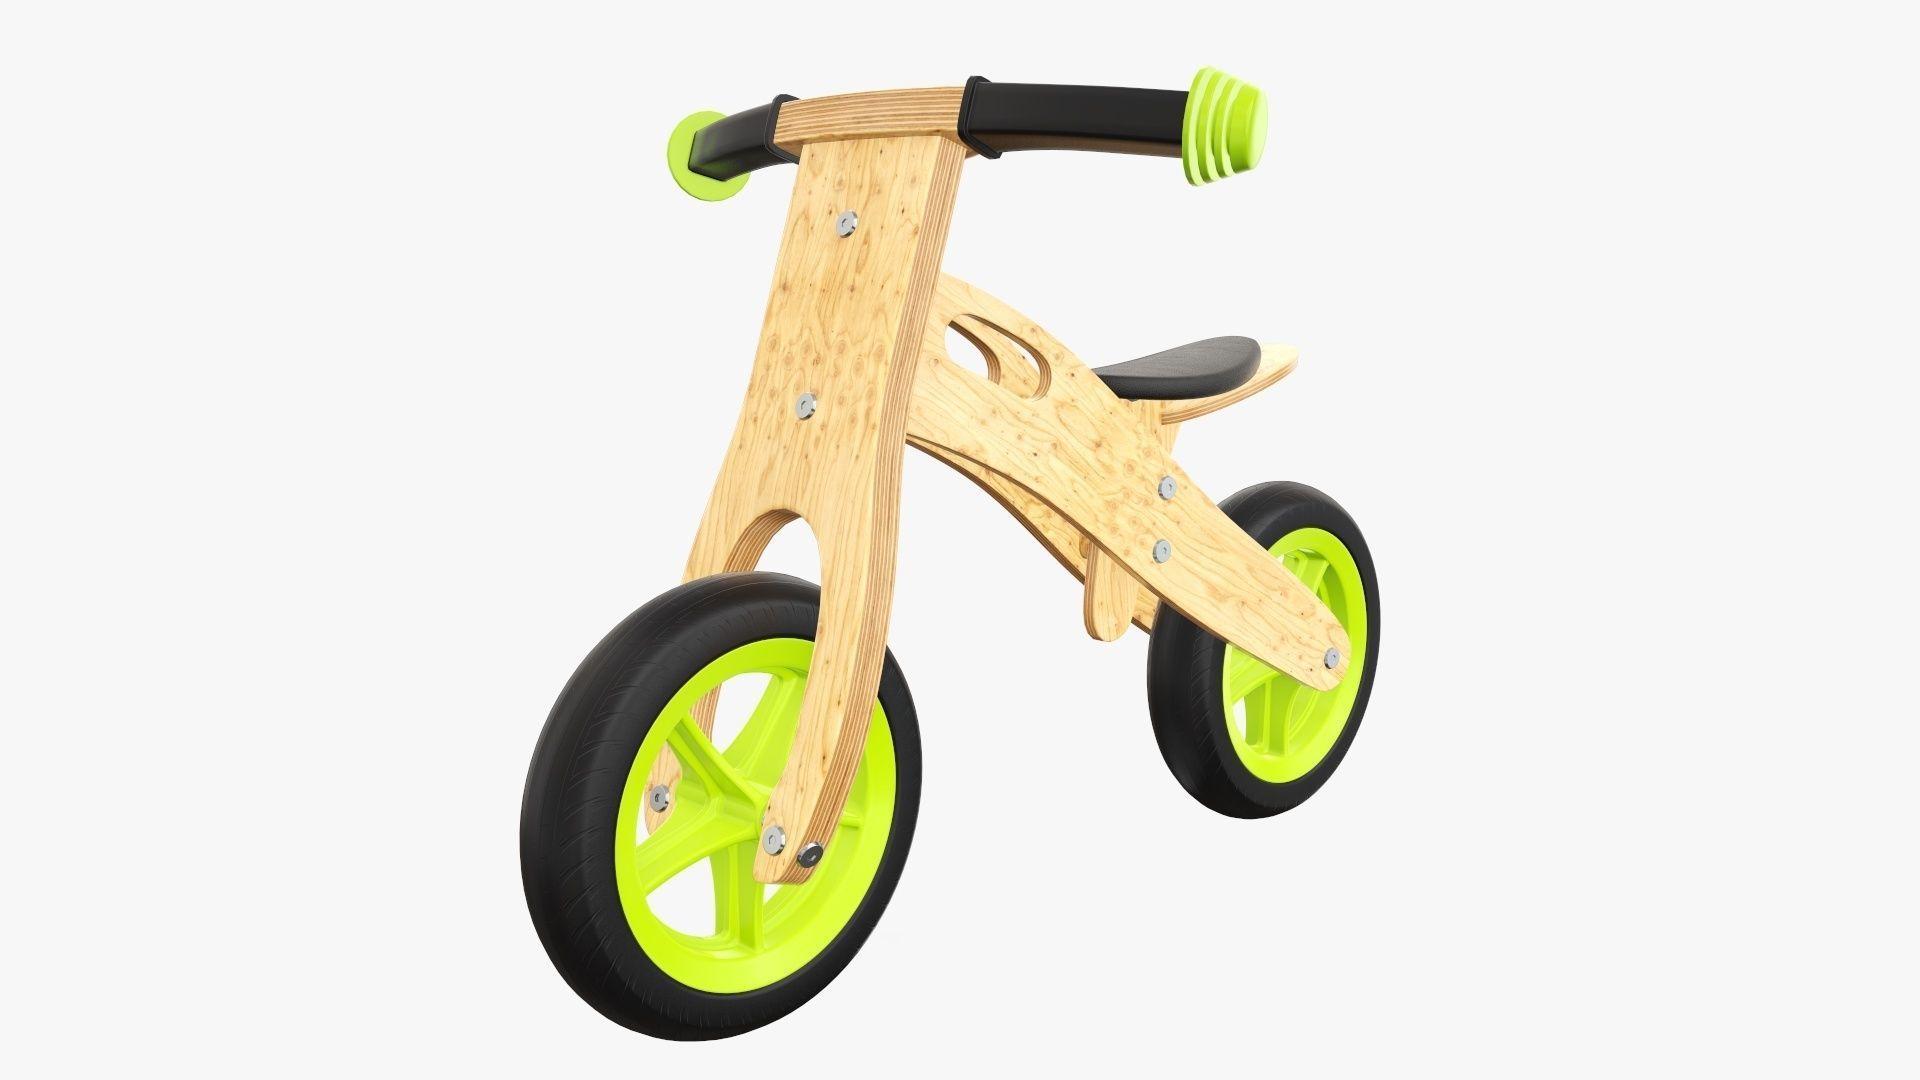 Balance bike for kids wooden v2